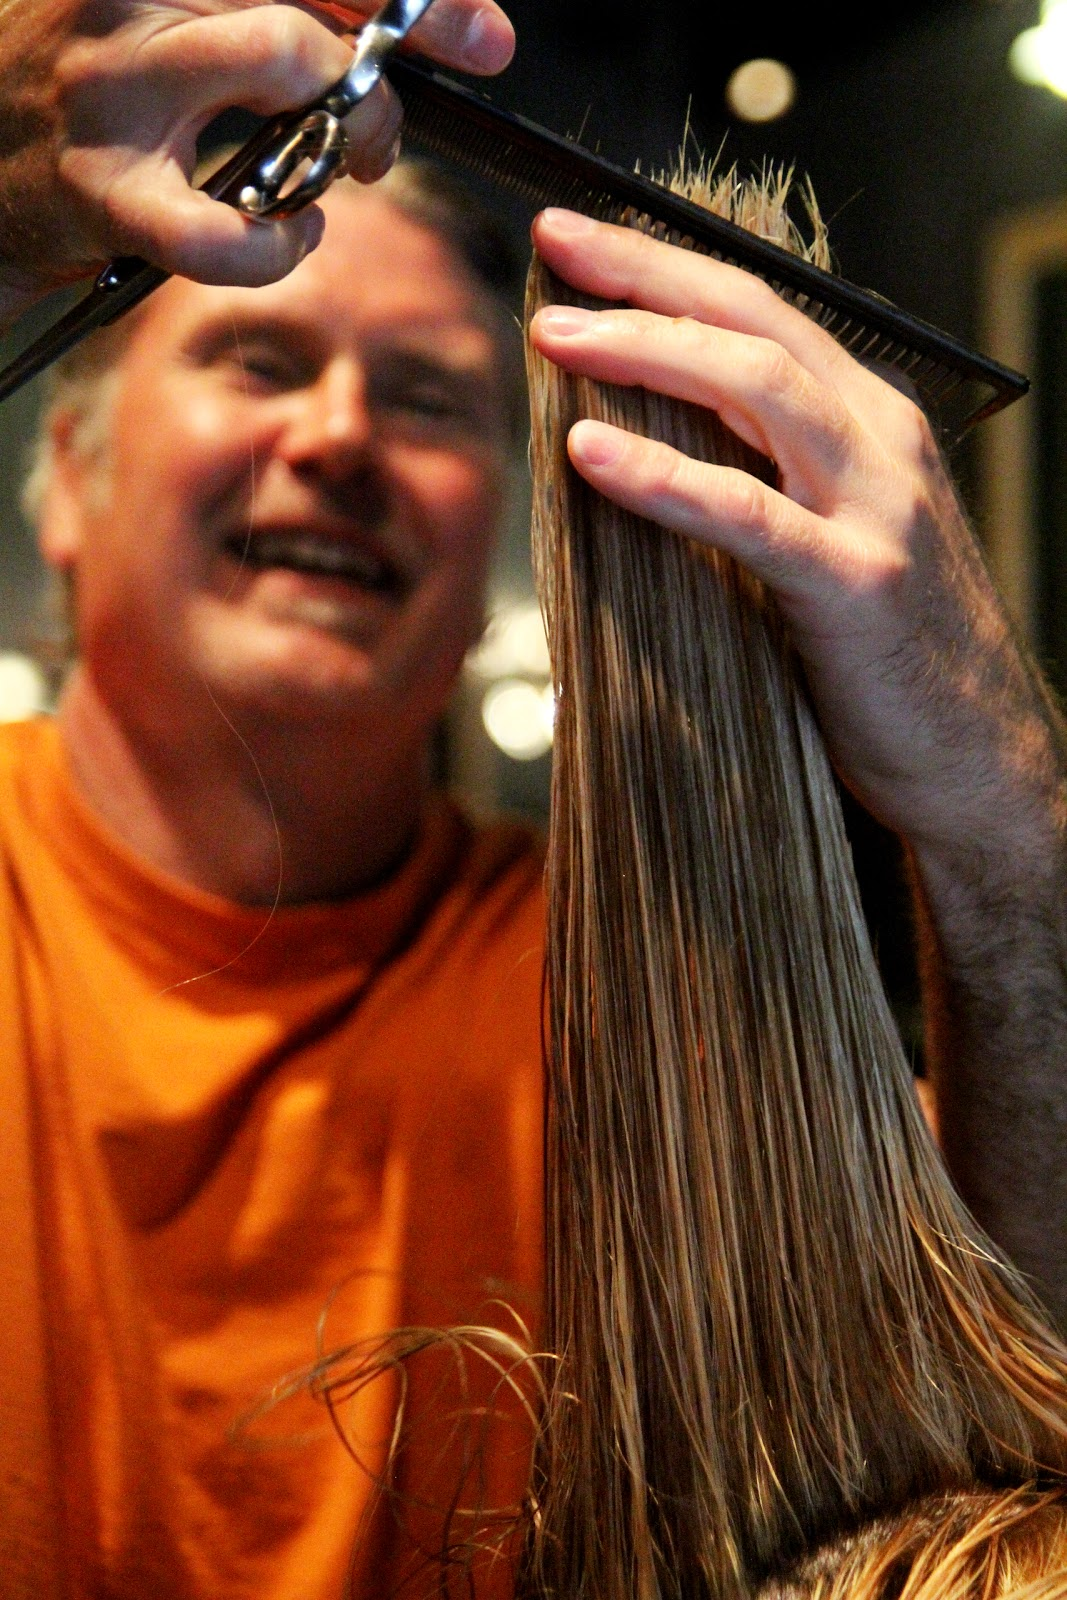 Hair Salons Kalispell Mt